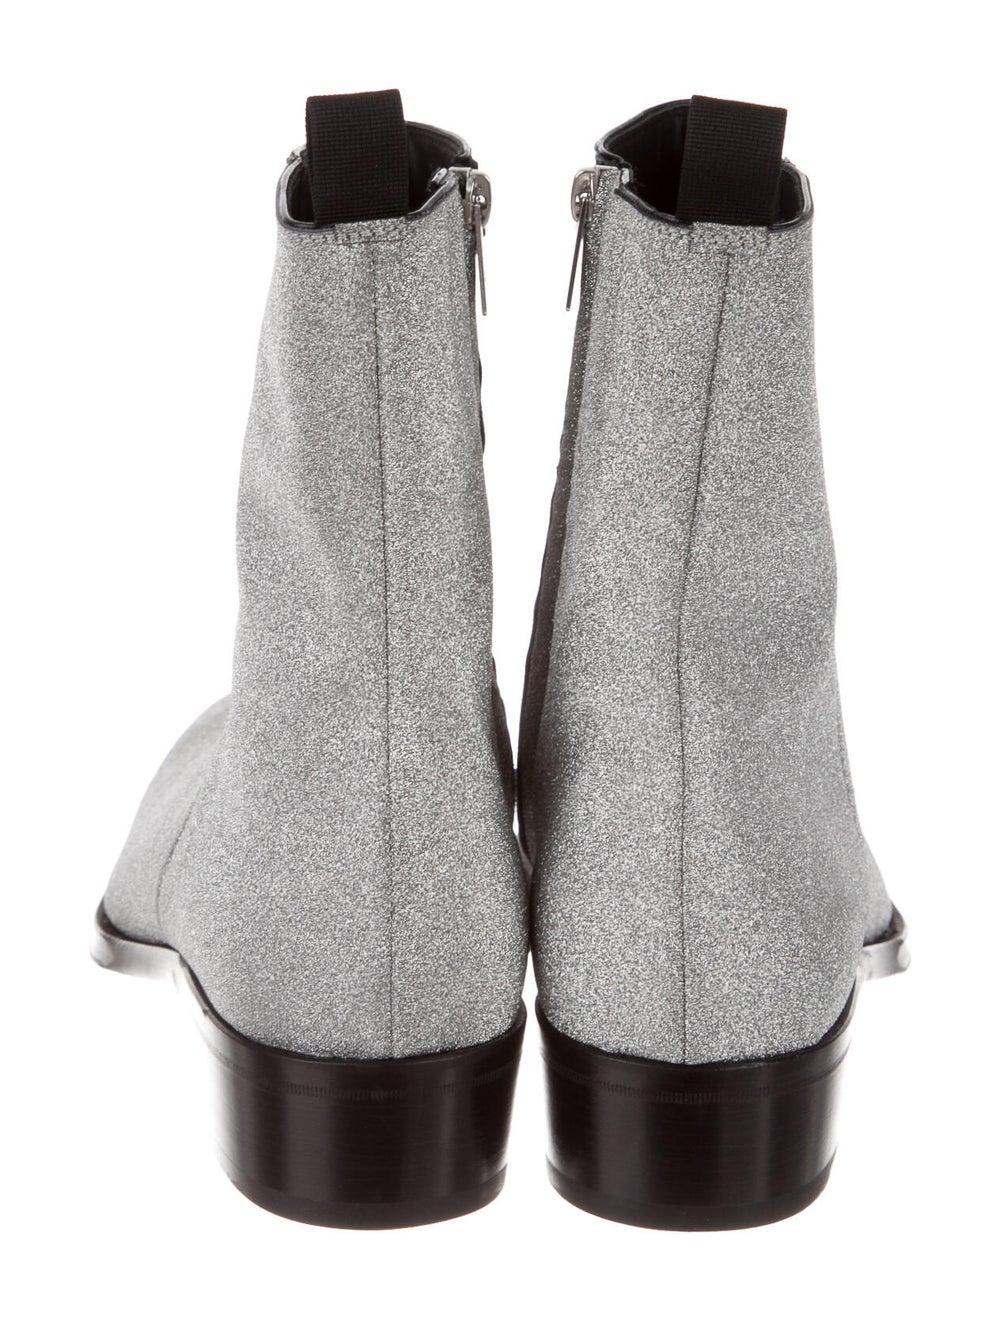 Alexander McQueen Boots Silver - image 4